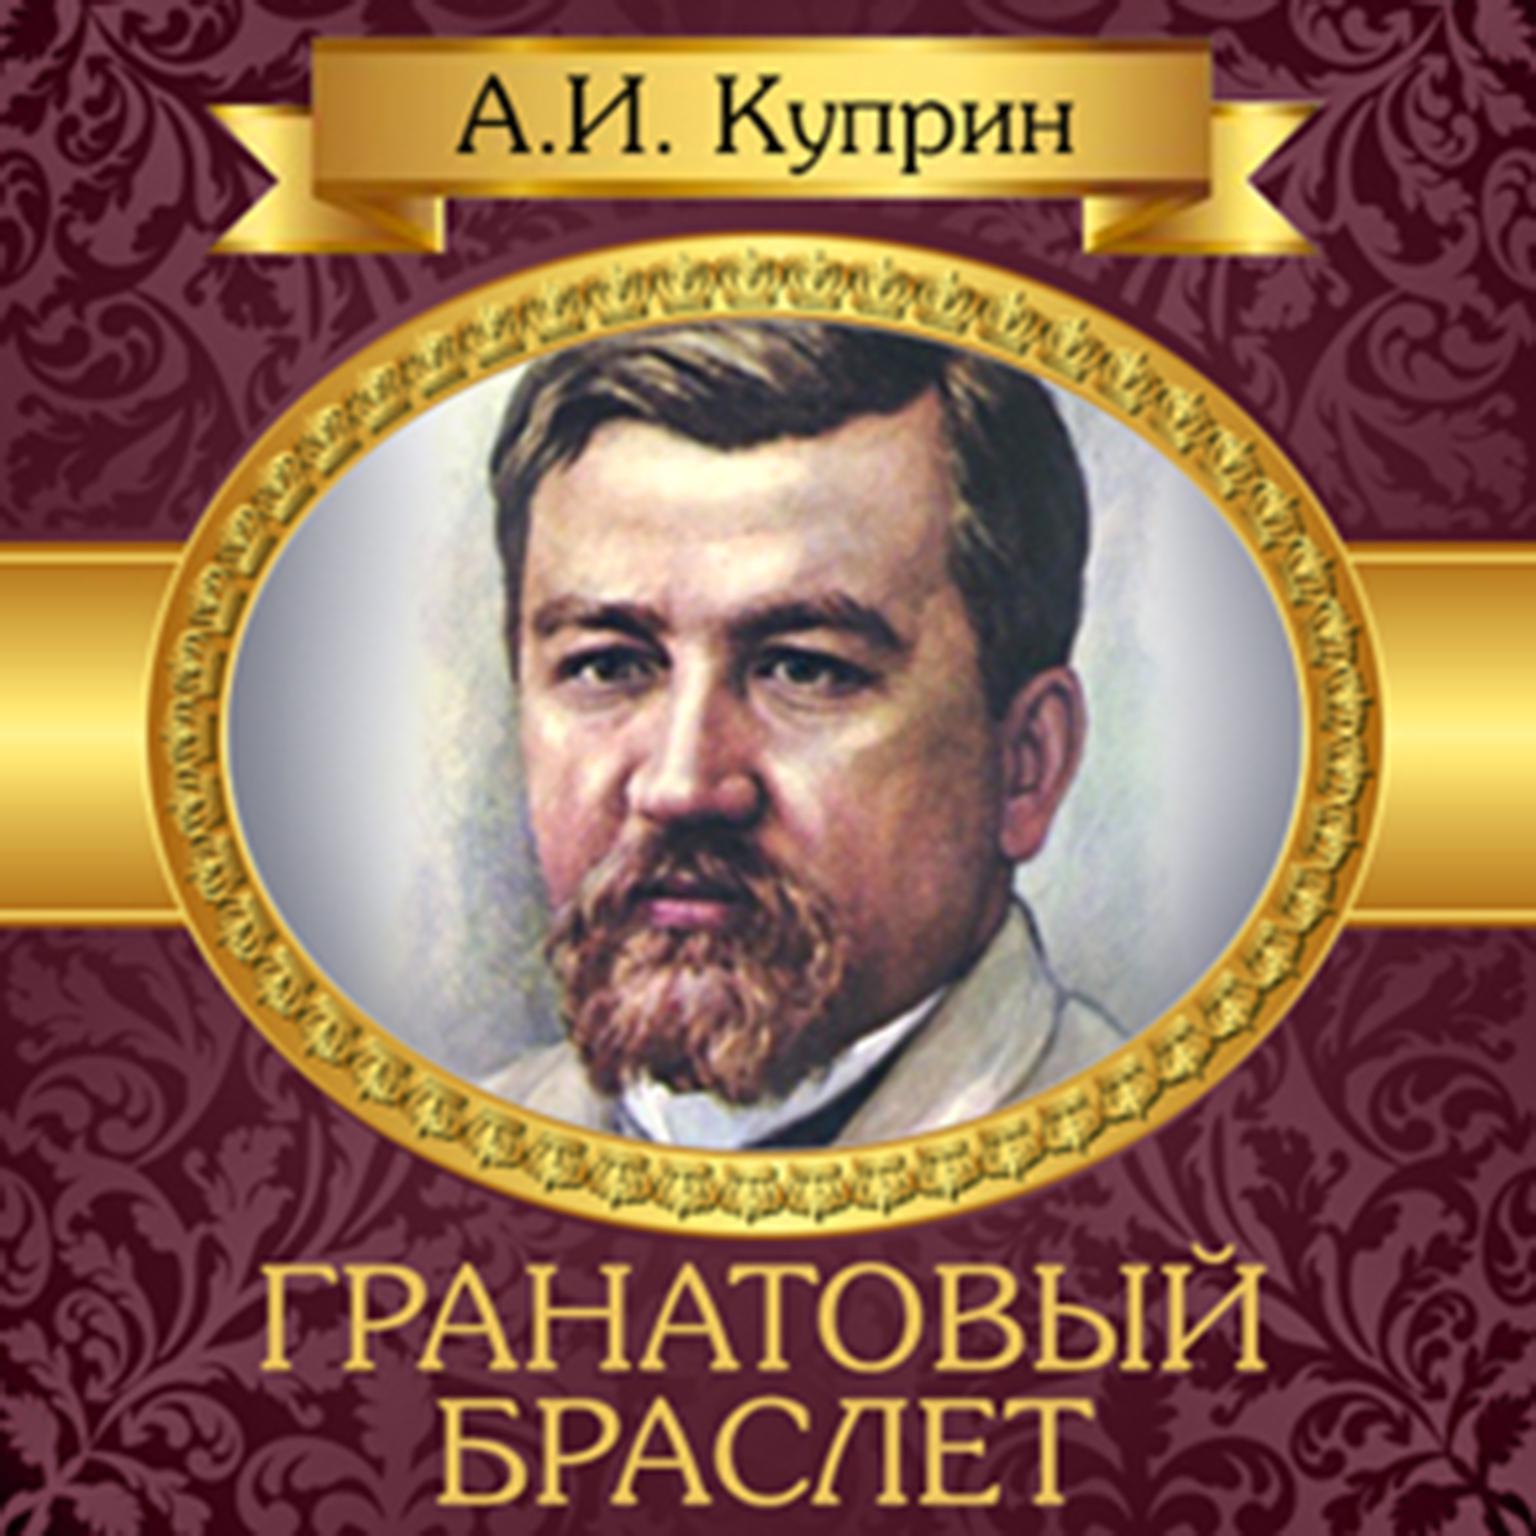 Garnet Bracelet [Russian Edition] Audiobook, by Alexander Kuprin